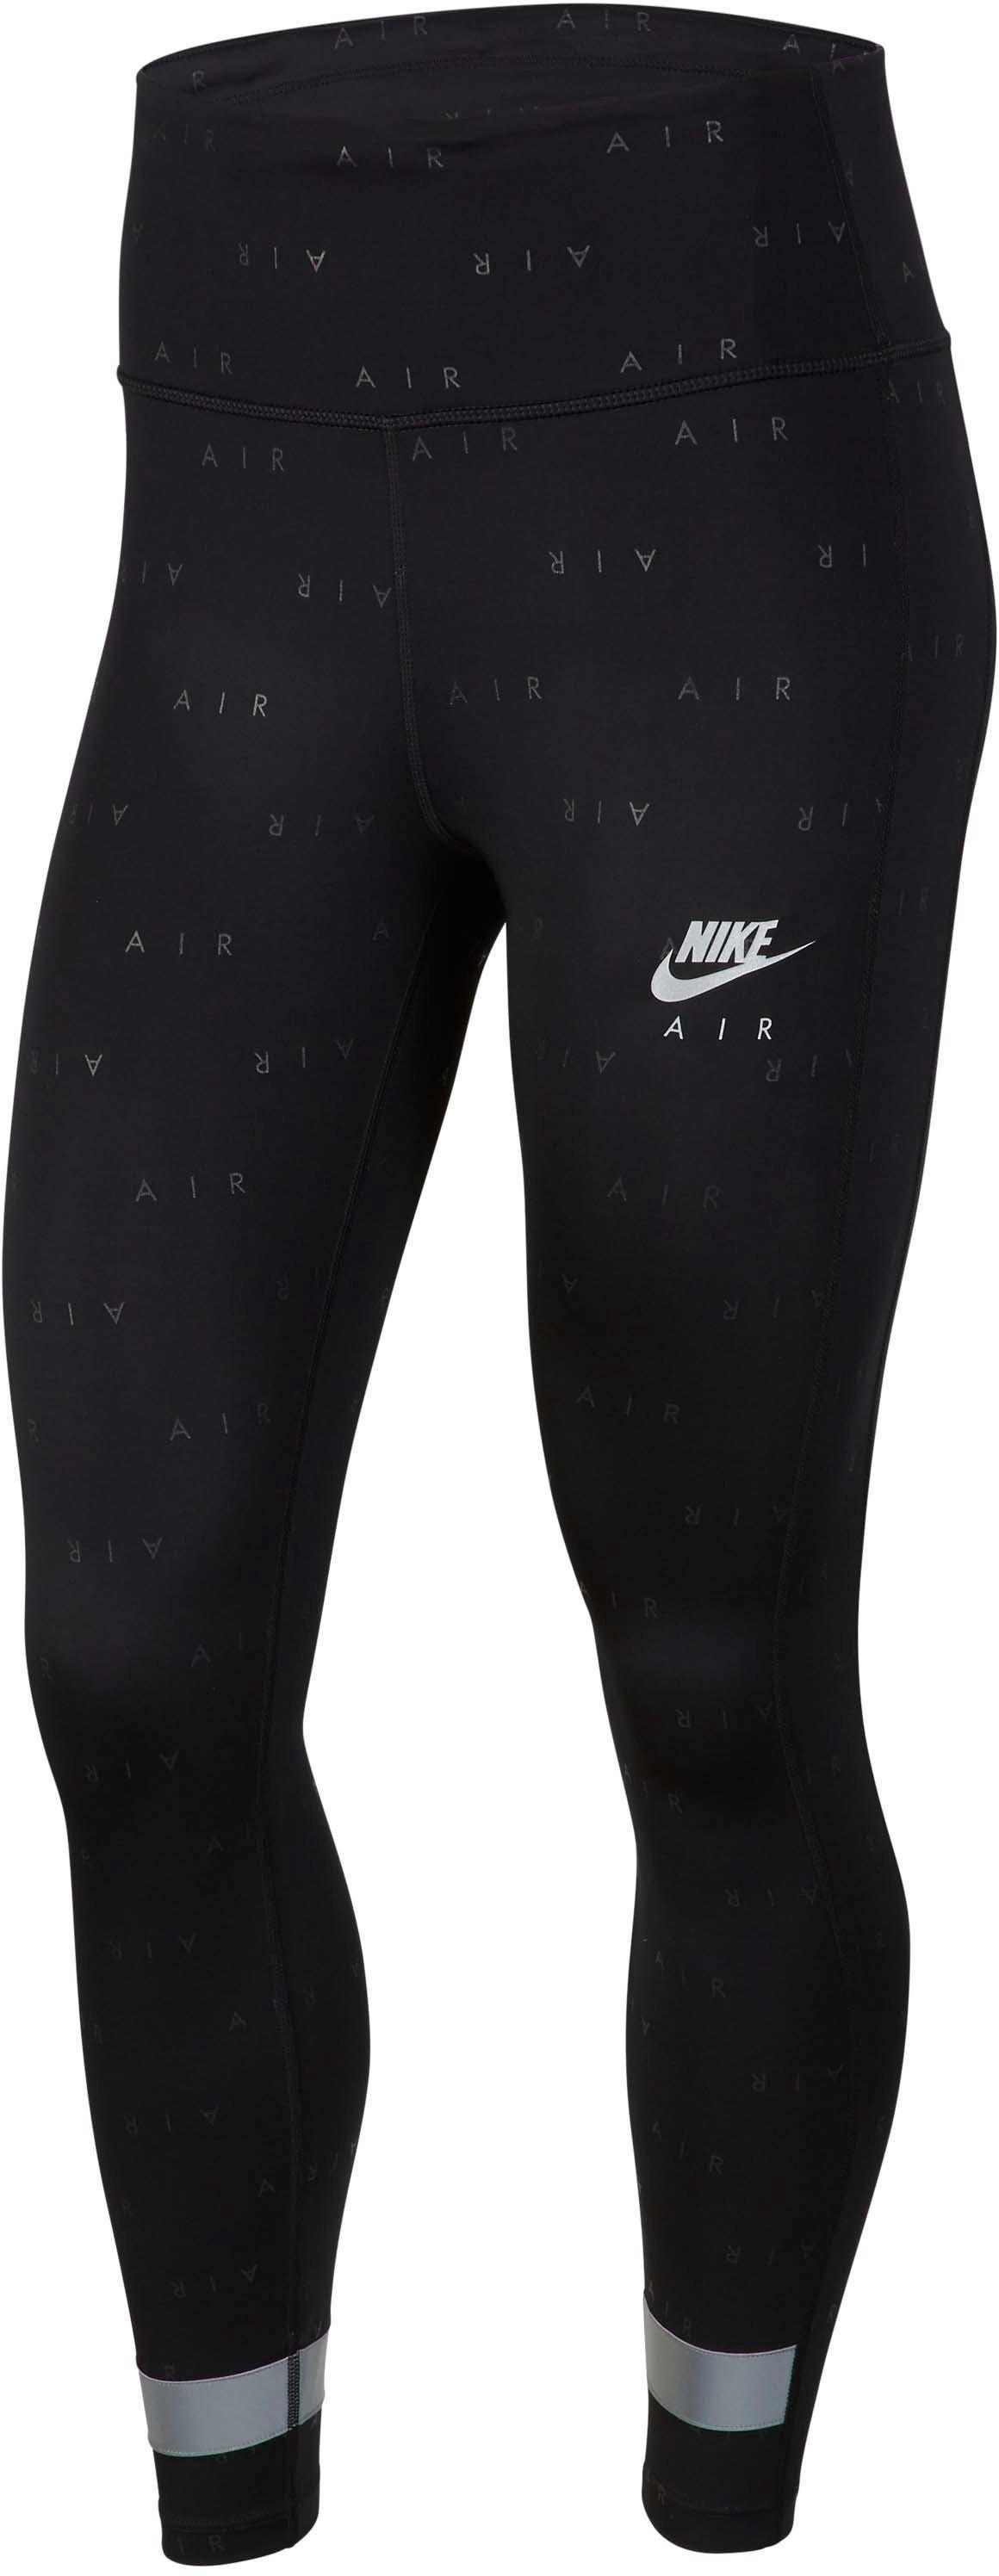 Nike runningtights »NIkE AIR 7/8 TIGHT PLUS SIZE« bestellen: 30 dagen bedenktijd